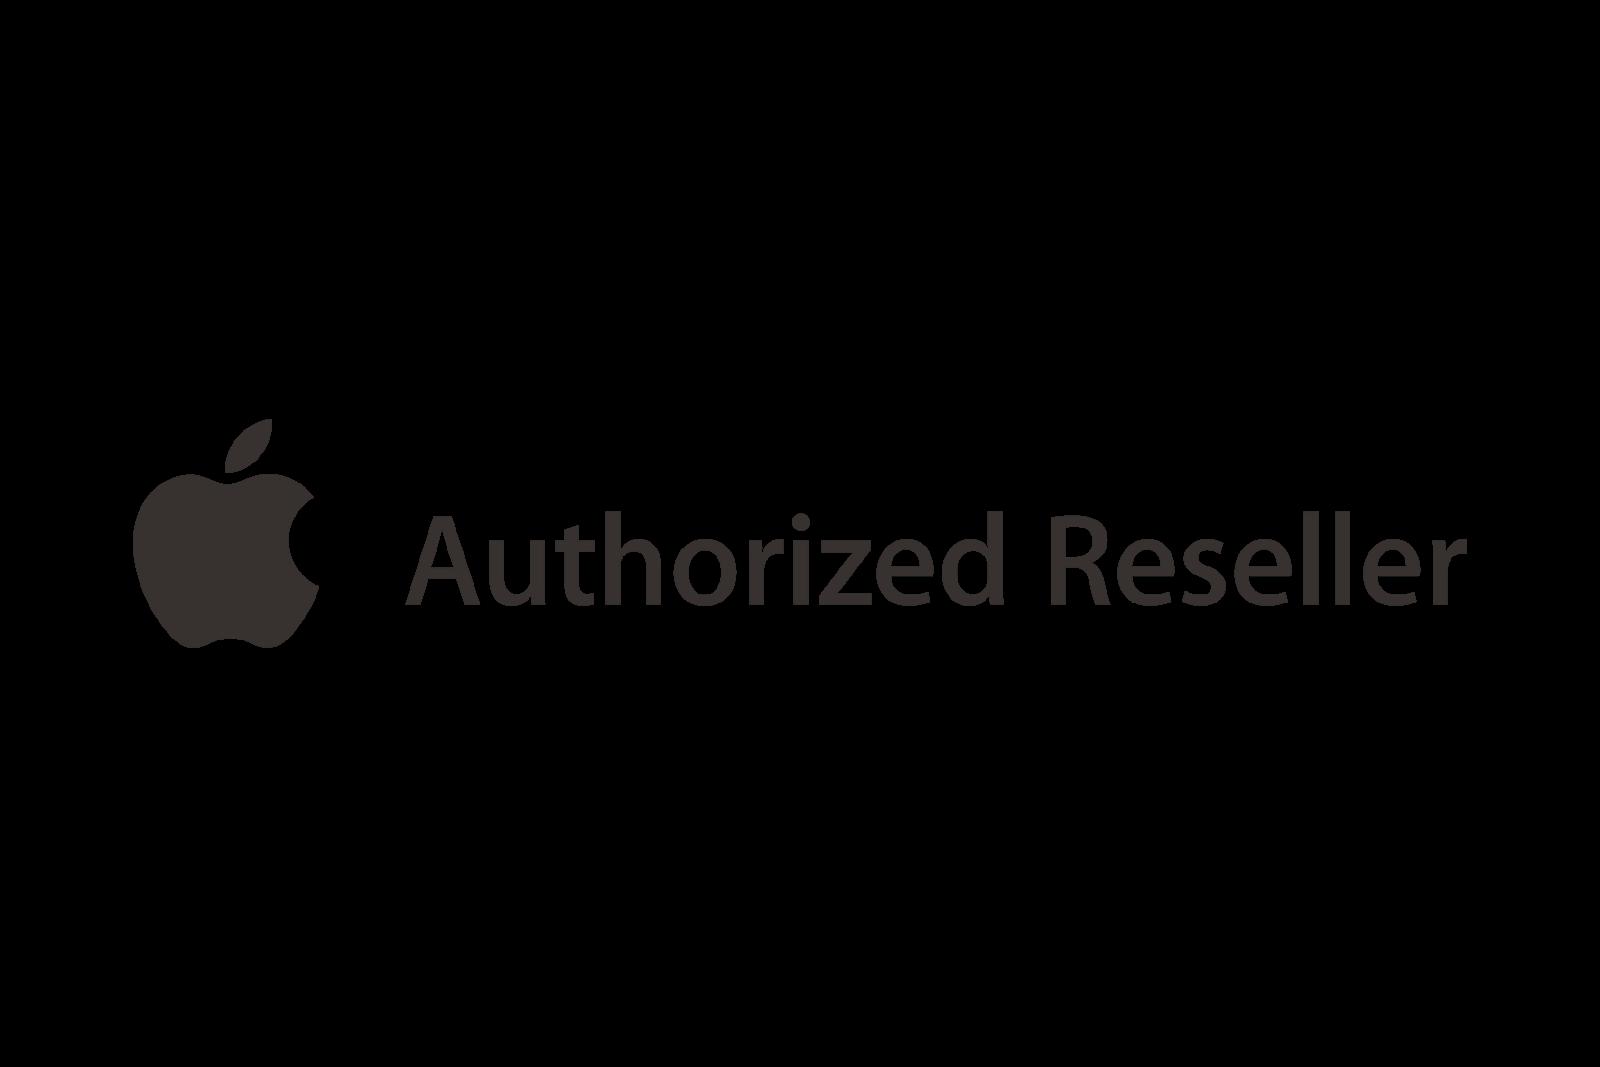 Apple Authorized Dealer Png Hdpng Pluspng.com 1600   Apple Authorized Dealer Png - Apple Authorized Reseller, Transparent background PNG HD thumbnail